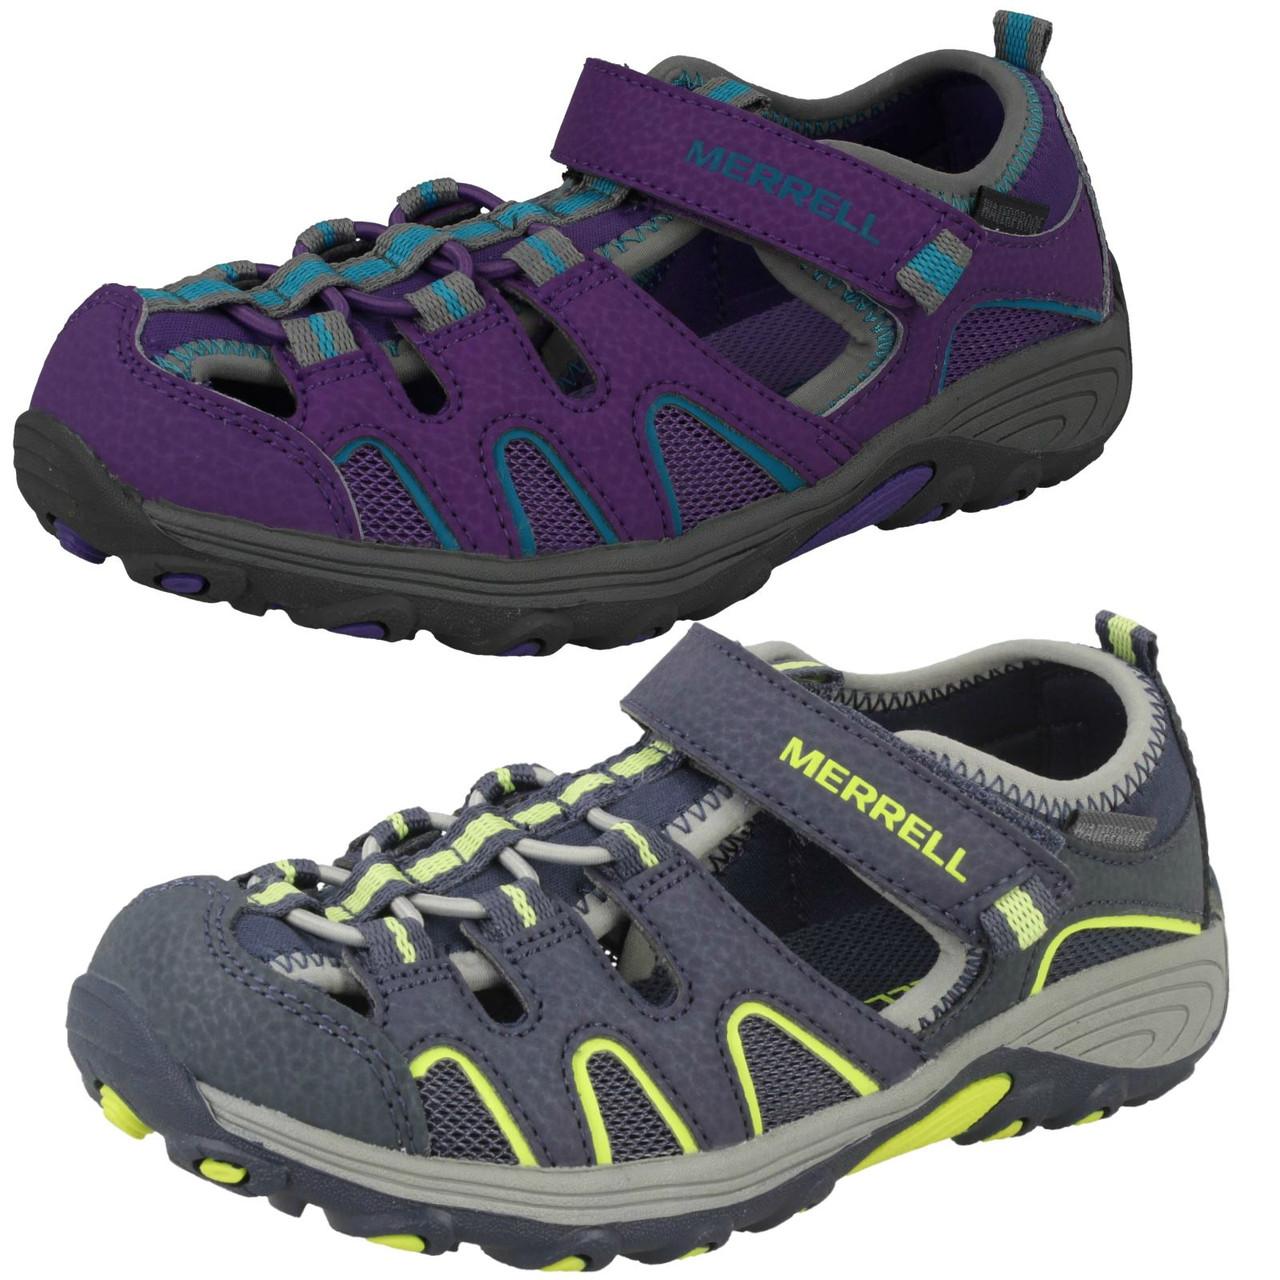 Childrens Merrell Casual Sandals ML-G